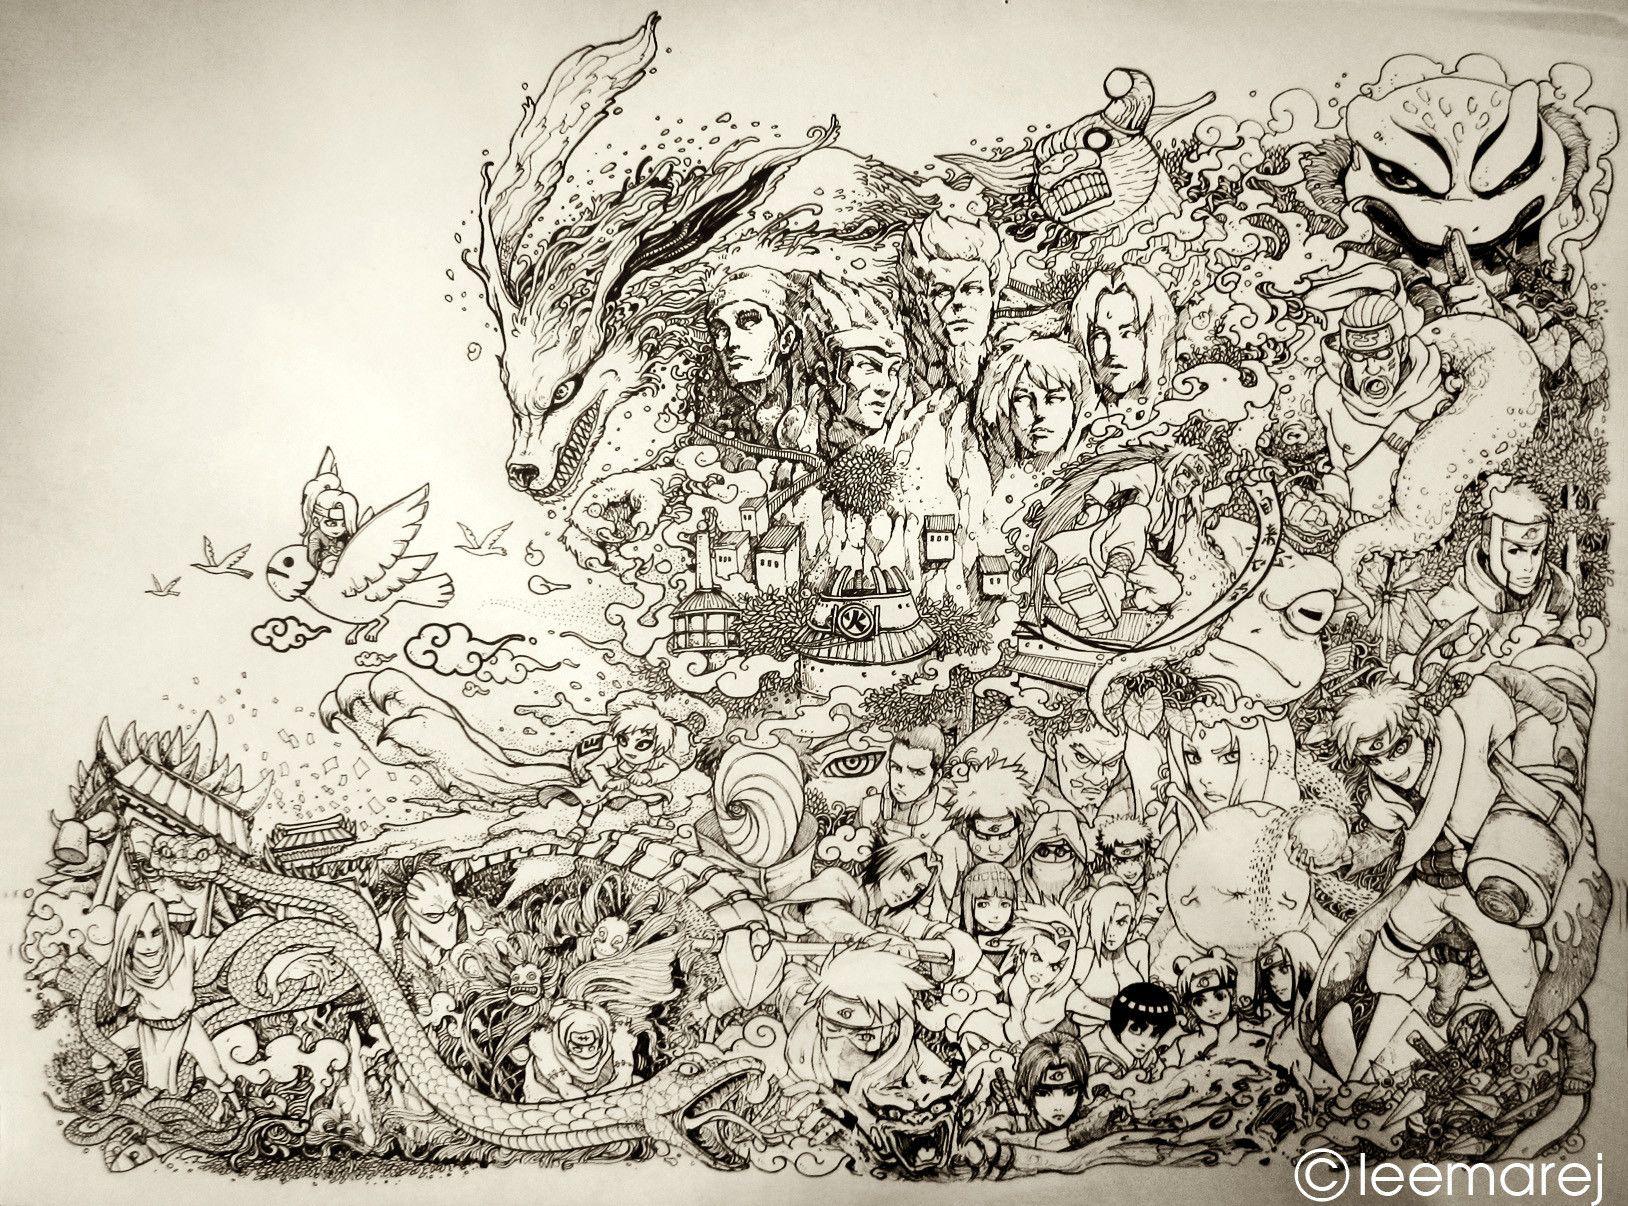 Naruto doodle